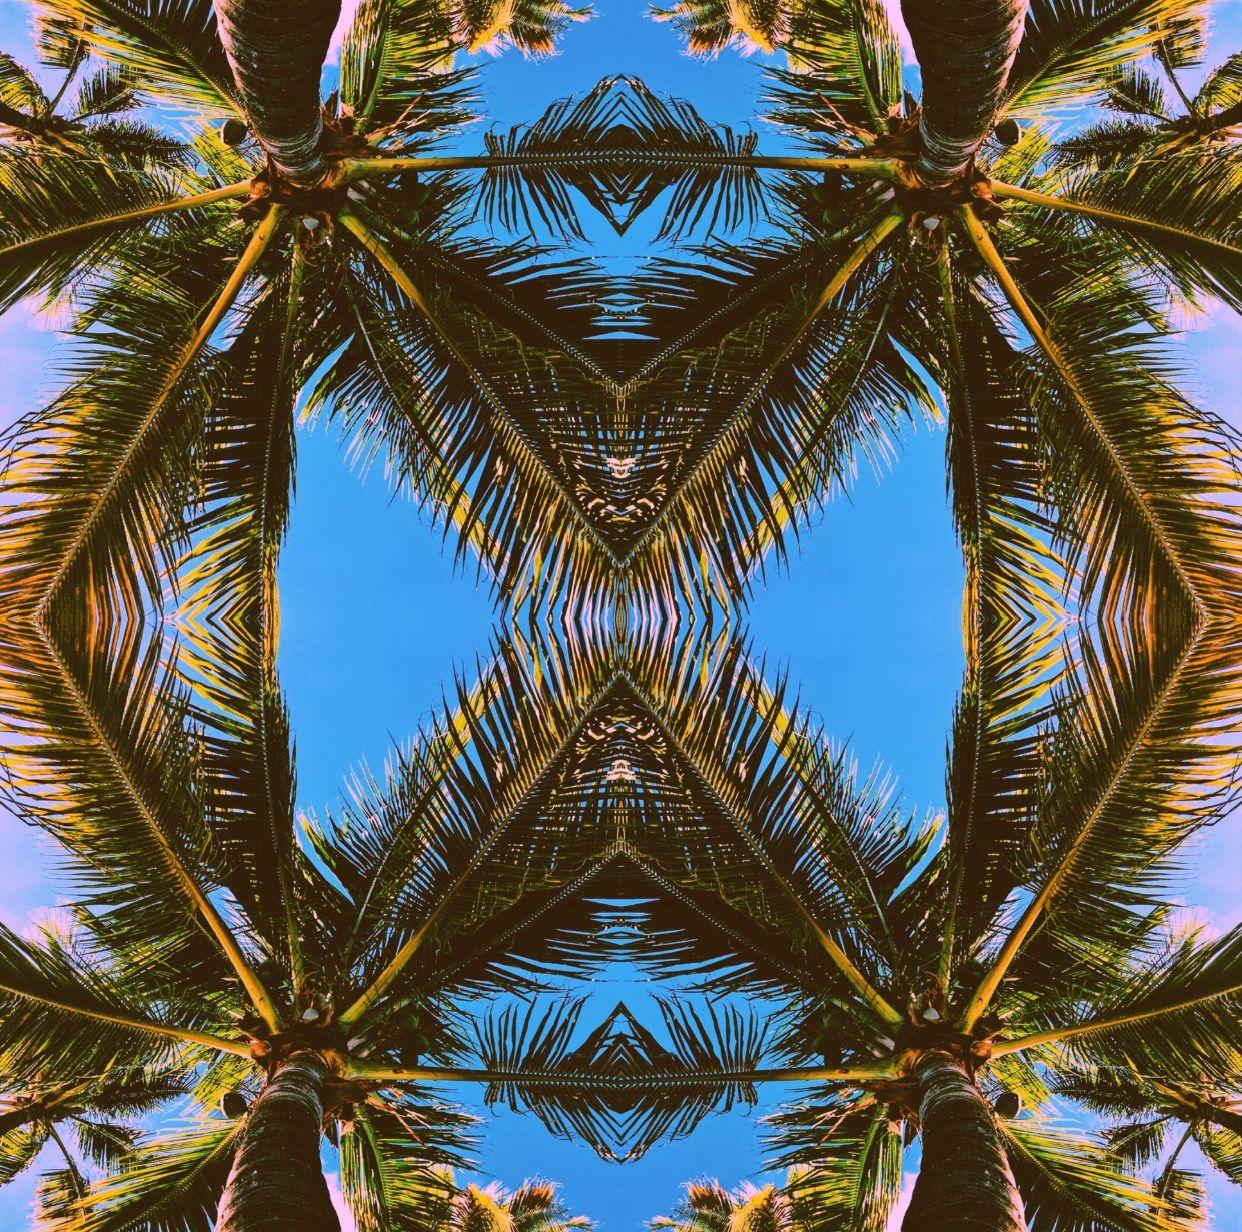 Palm tree daze #islandcompany #whatiswinter #palmtrees #escape